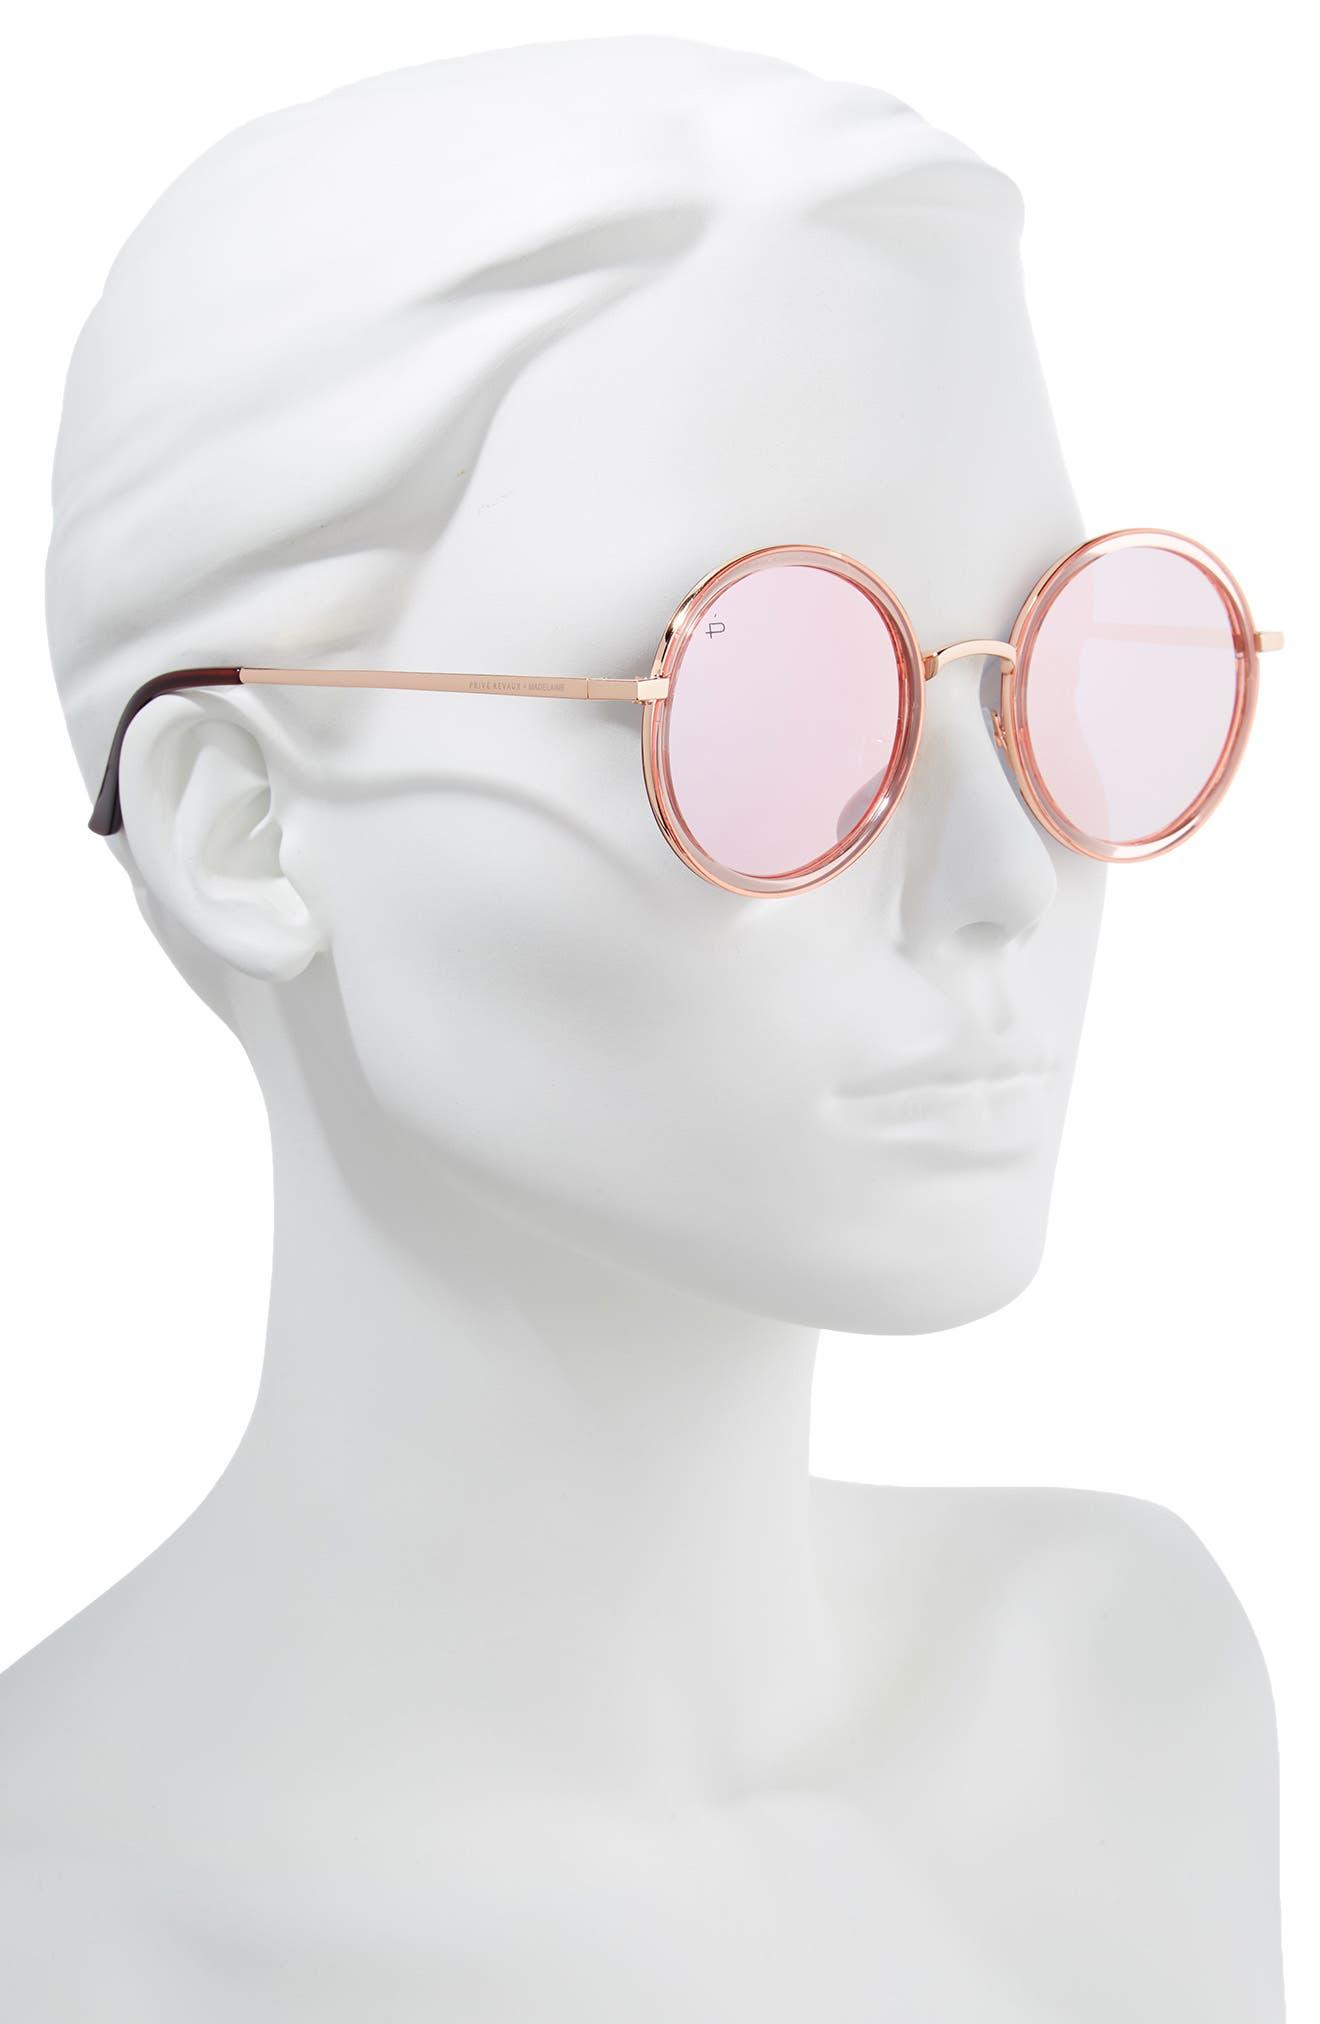 Privé Revaux x Madelaine Petsch The Street 53mm Round Sunglasses,                             Alternate thumbnail 6, color,